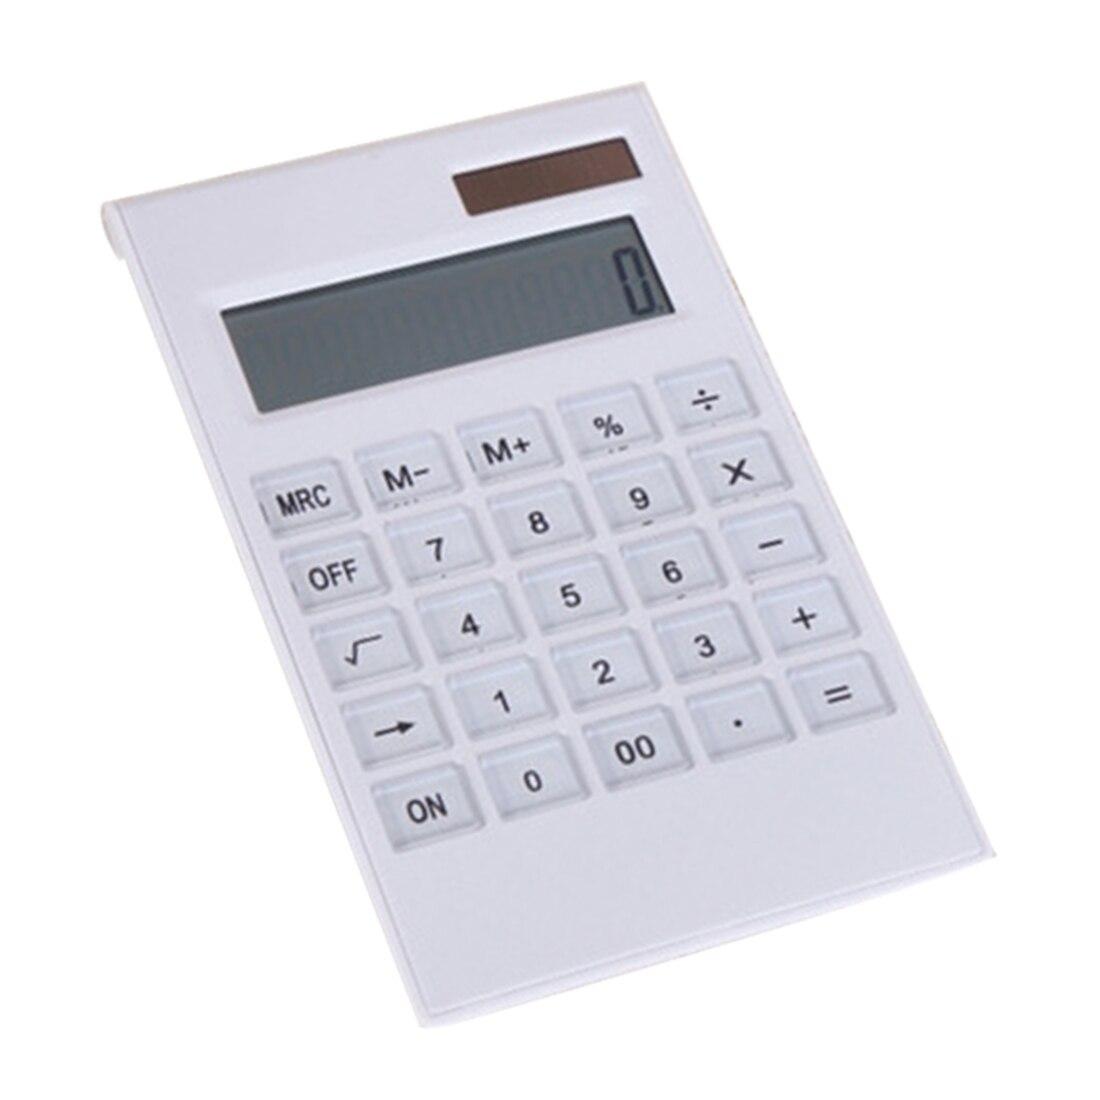 NOYOKERE Portable Creative Slim Mini 12 Digital Calculator Solar Energy Crystal Keyboard Dual Power Supply